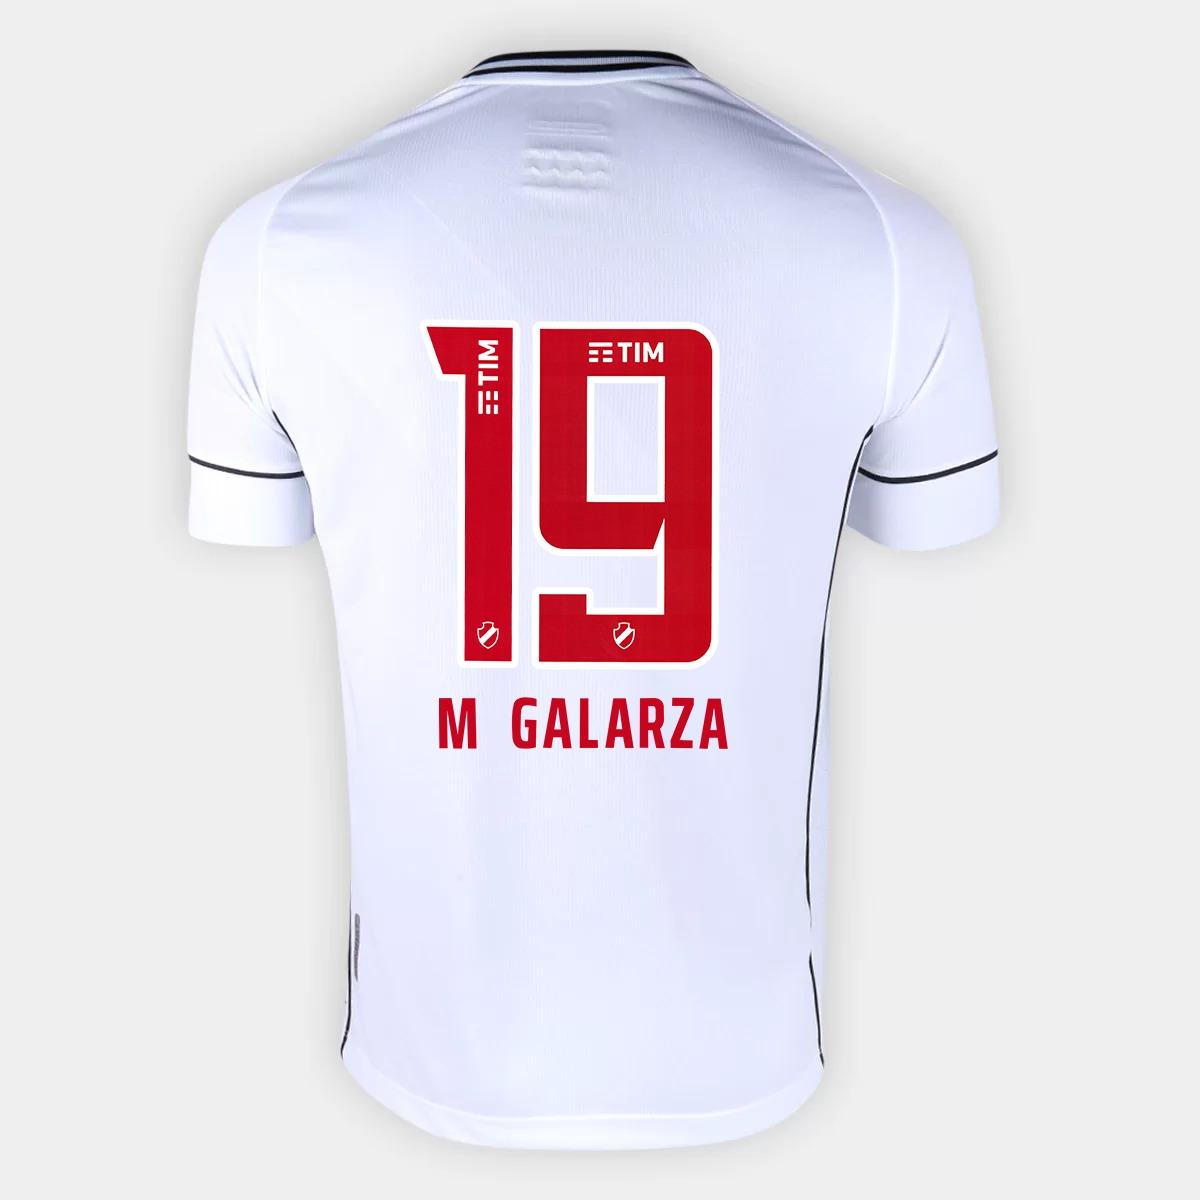 CAMISA VASCO II KAPPA 2020/2021 - GALARZA